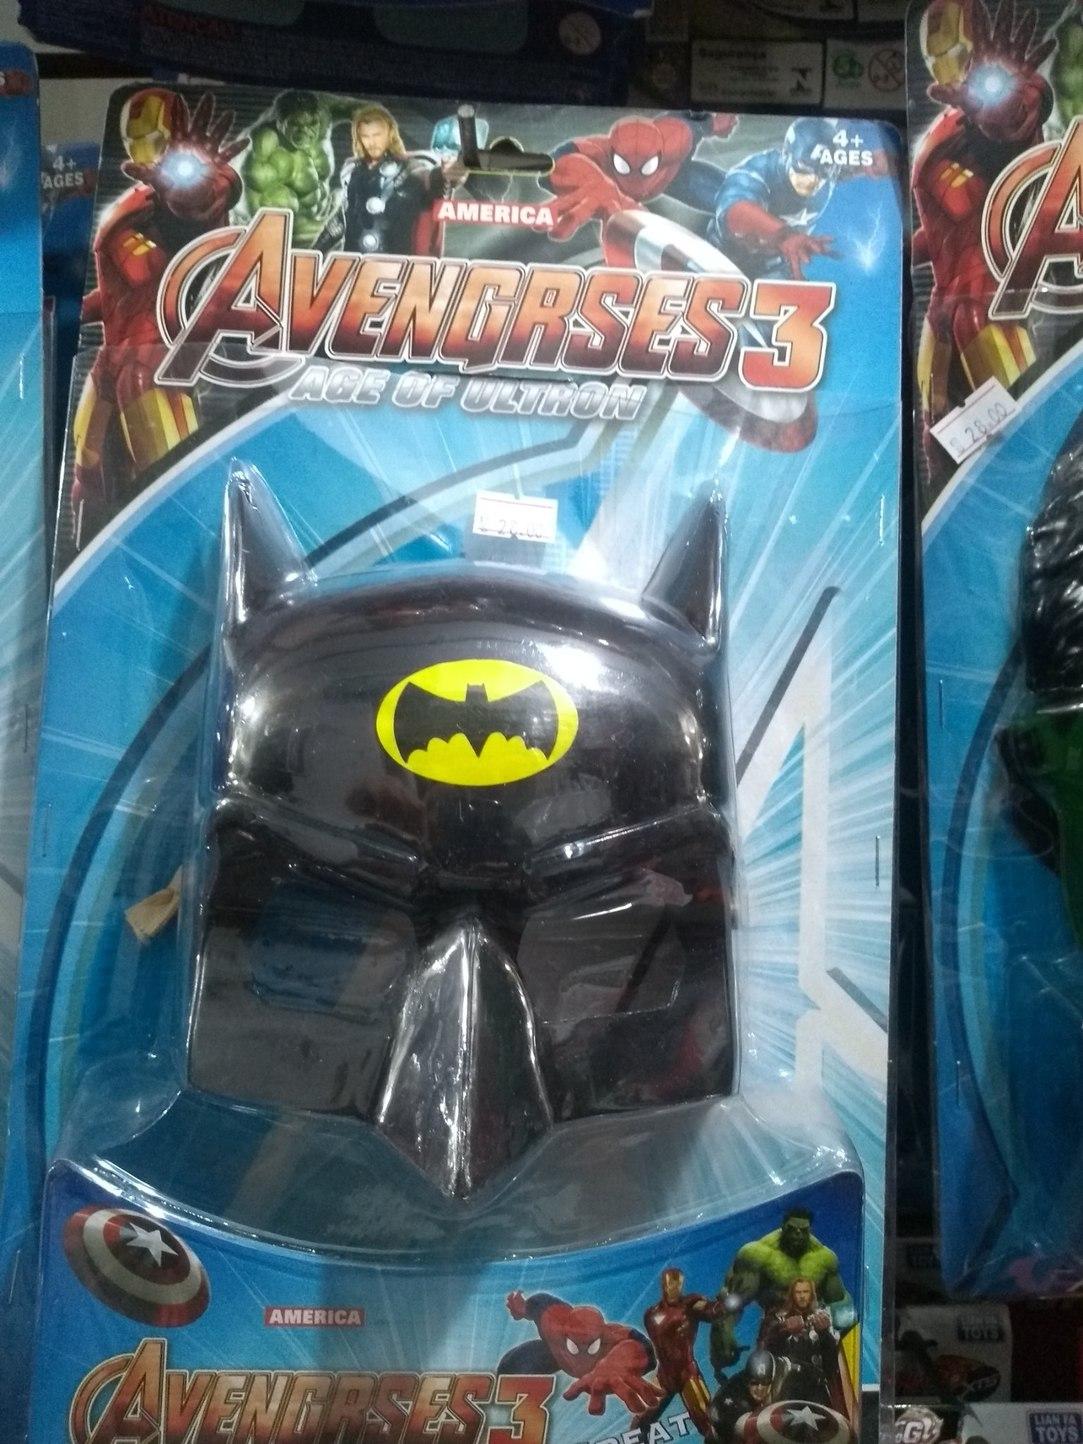 Batman vingador fodase - meme